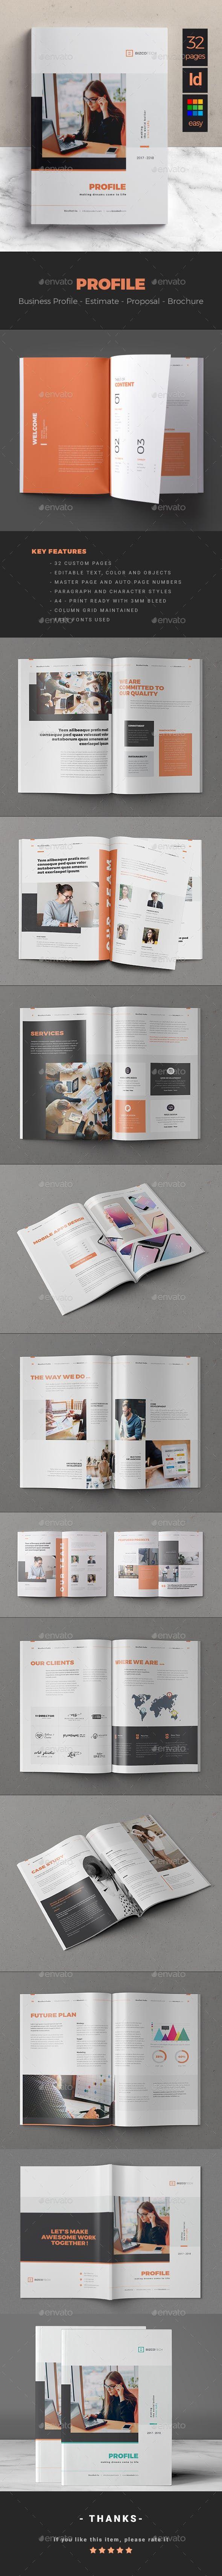 #Company Profile - #Corporate #Brochures